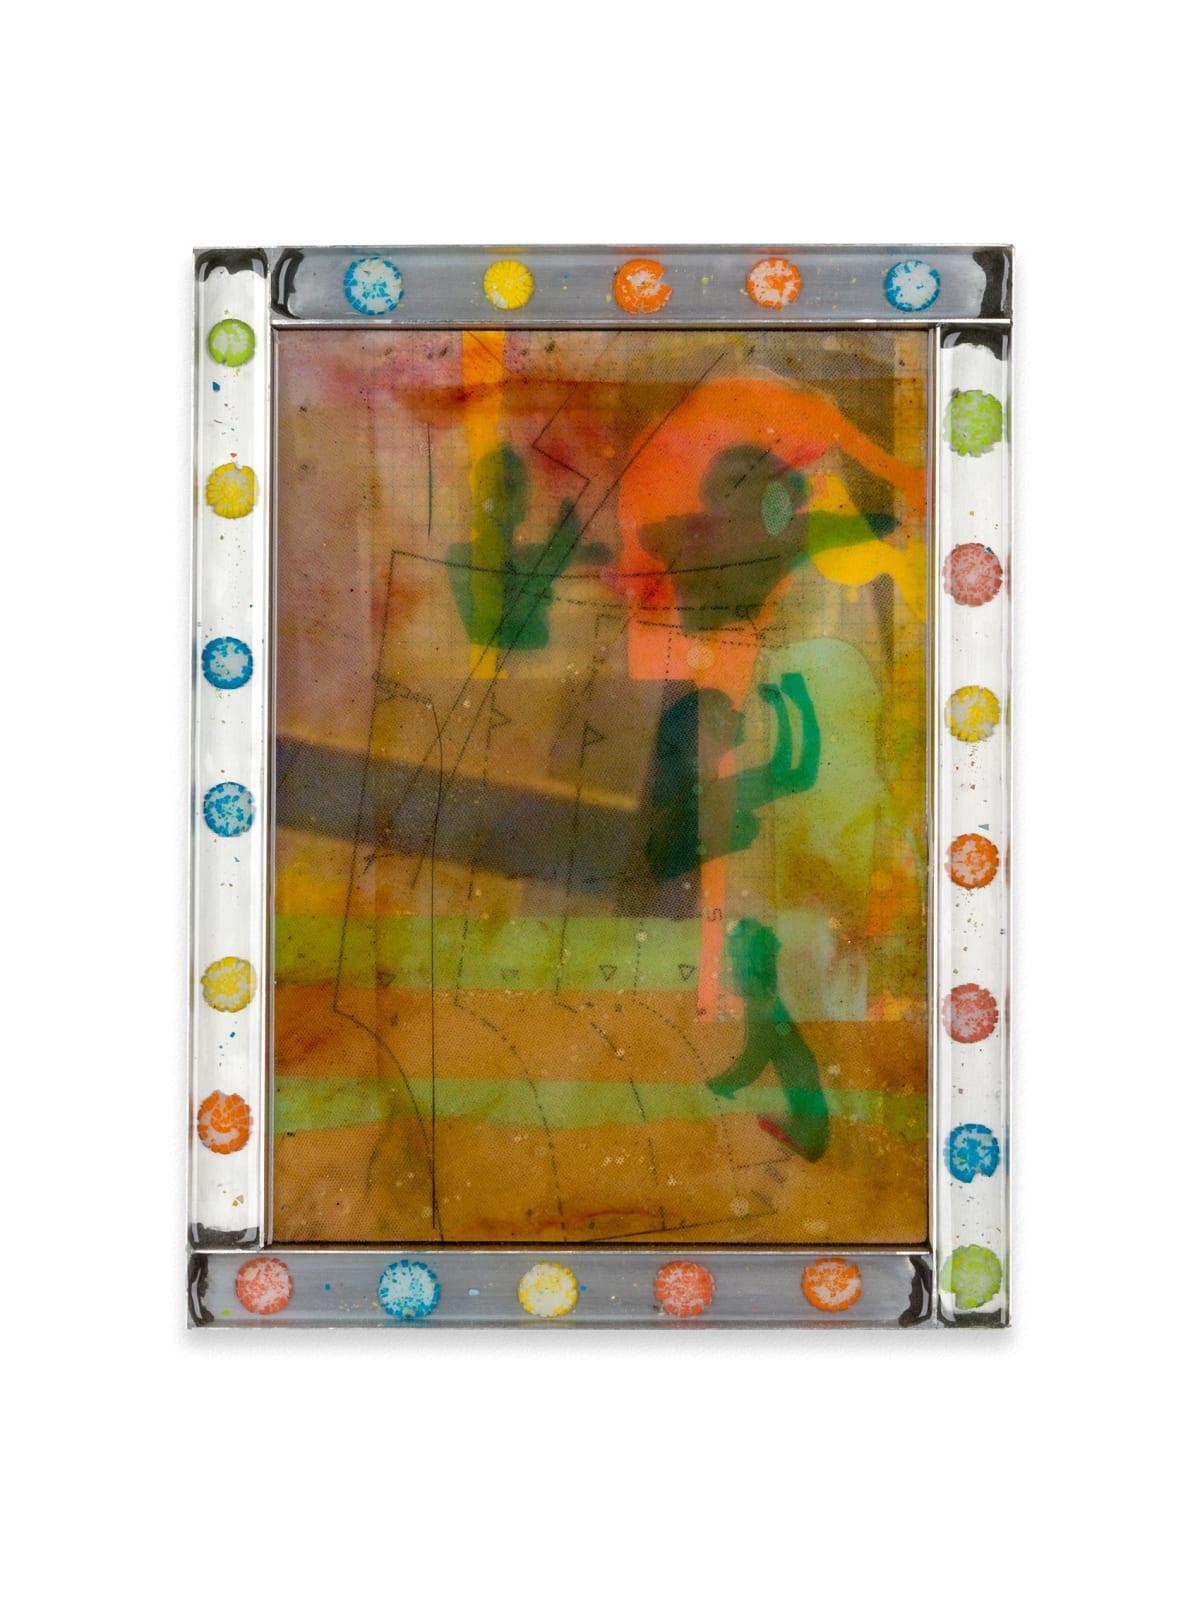 monroy honeycutt, artist, chicago, on view, featured